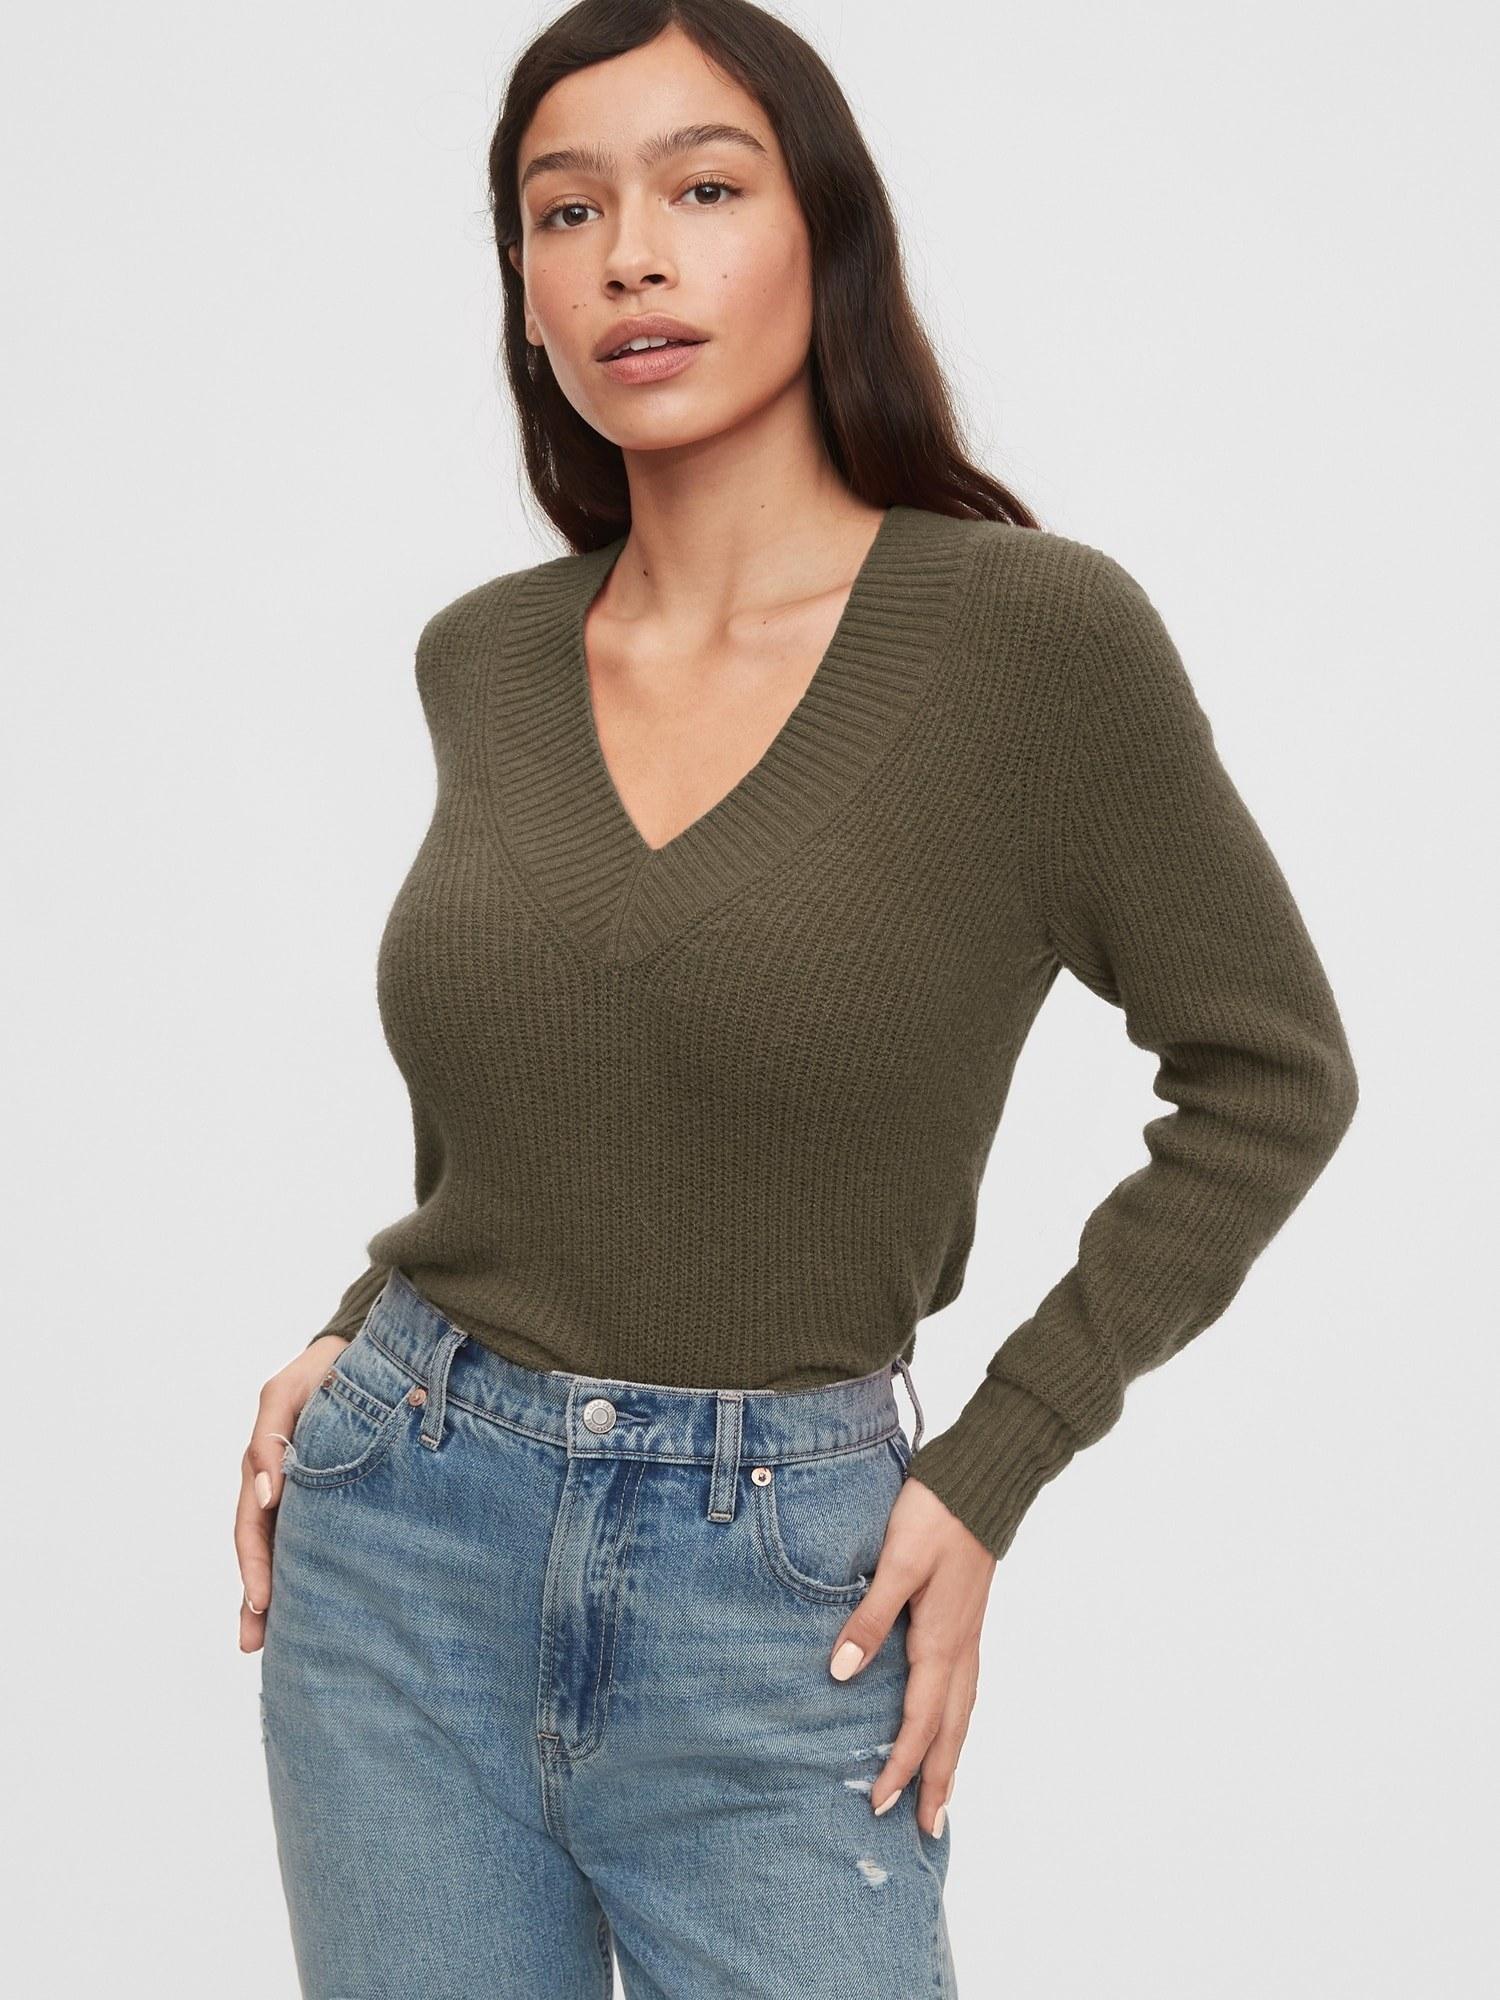 model wearing v-neck sweater in olive green